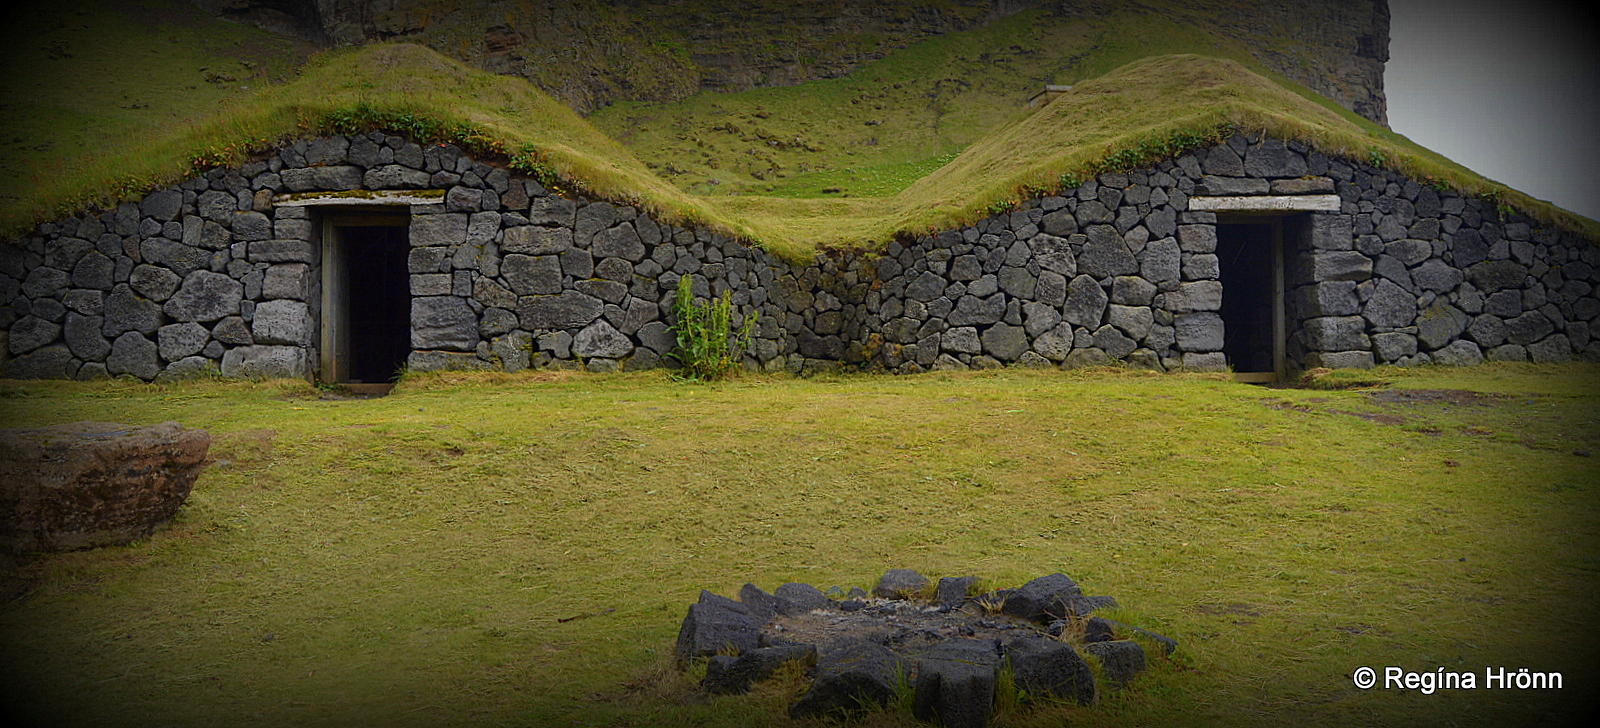 Herjólfsbærinn - Herjólfur\'s Old Farmstead in the Westman Islands